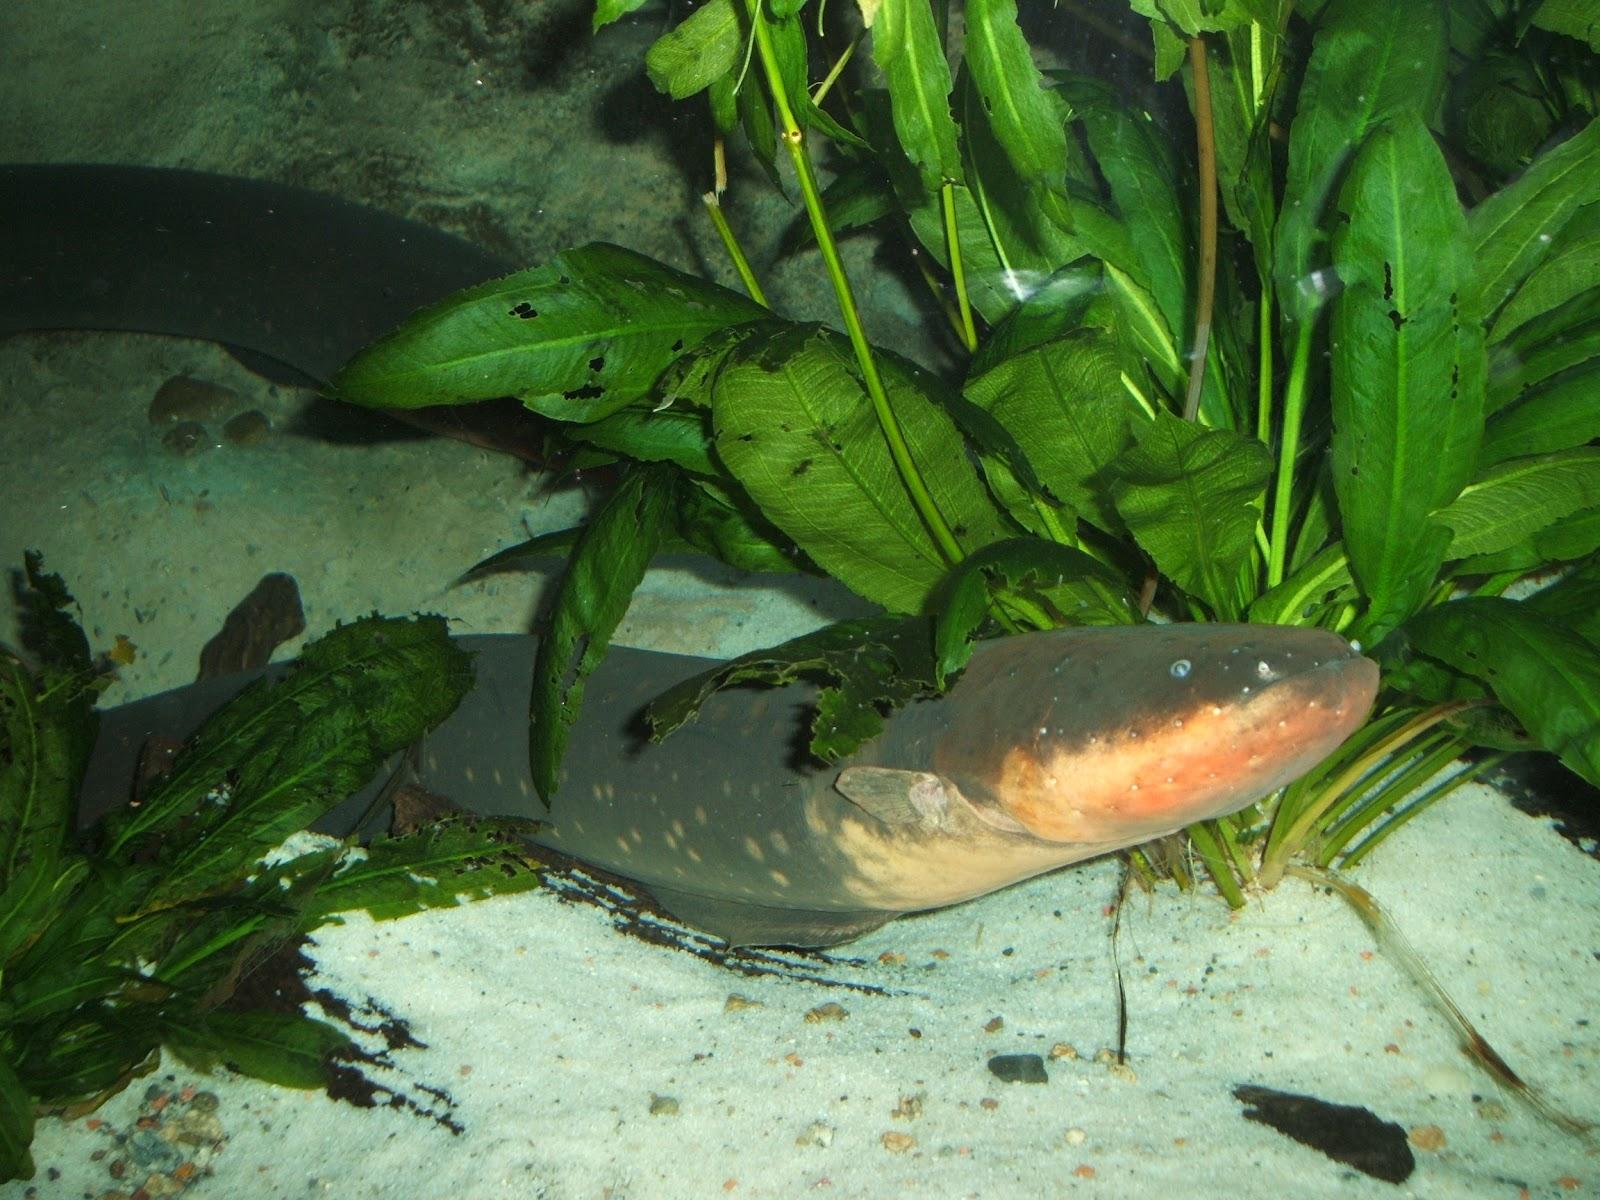 File:Electric-eel.jpg - Wikimedia Commons